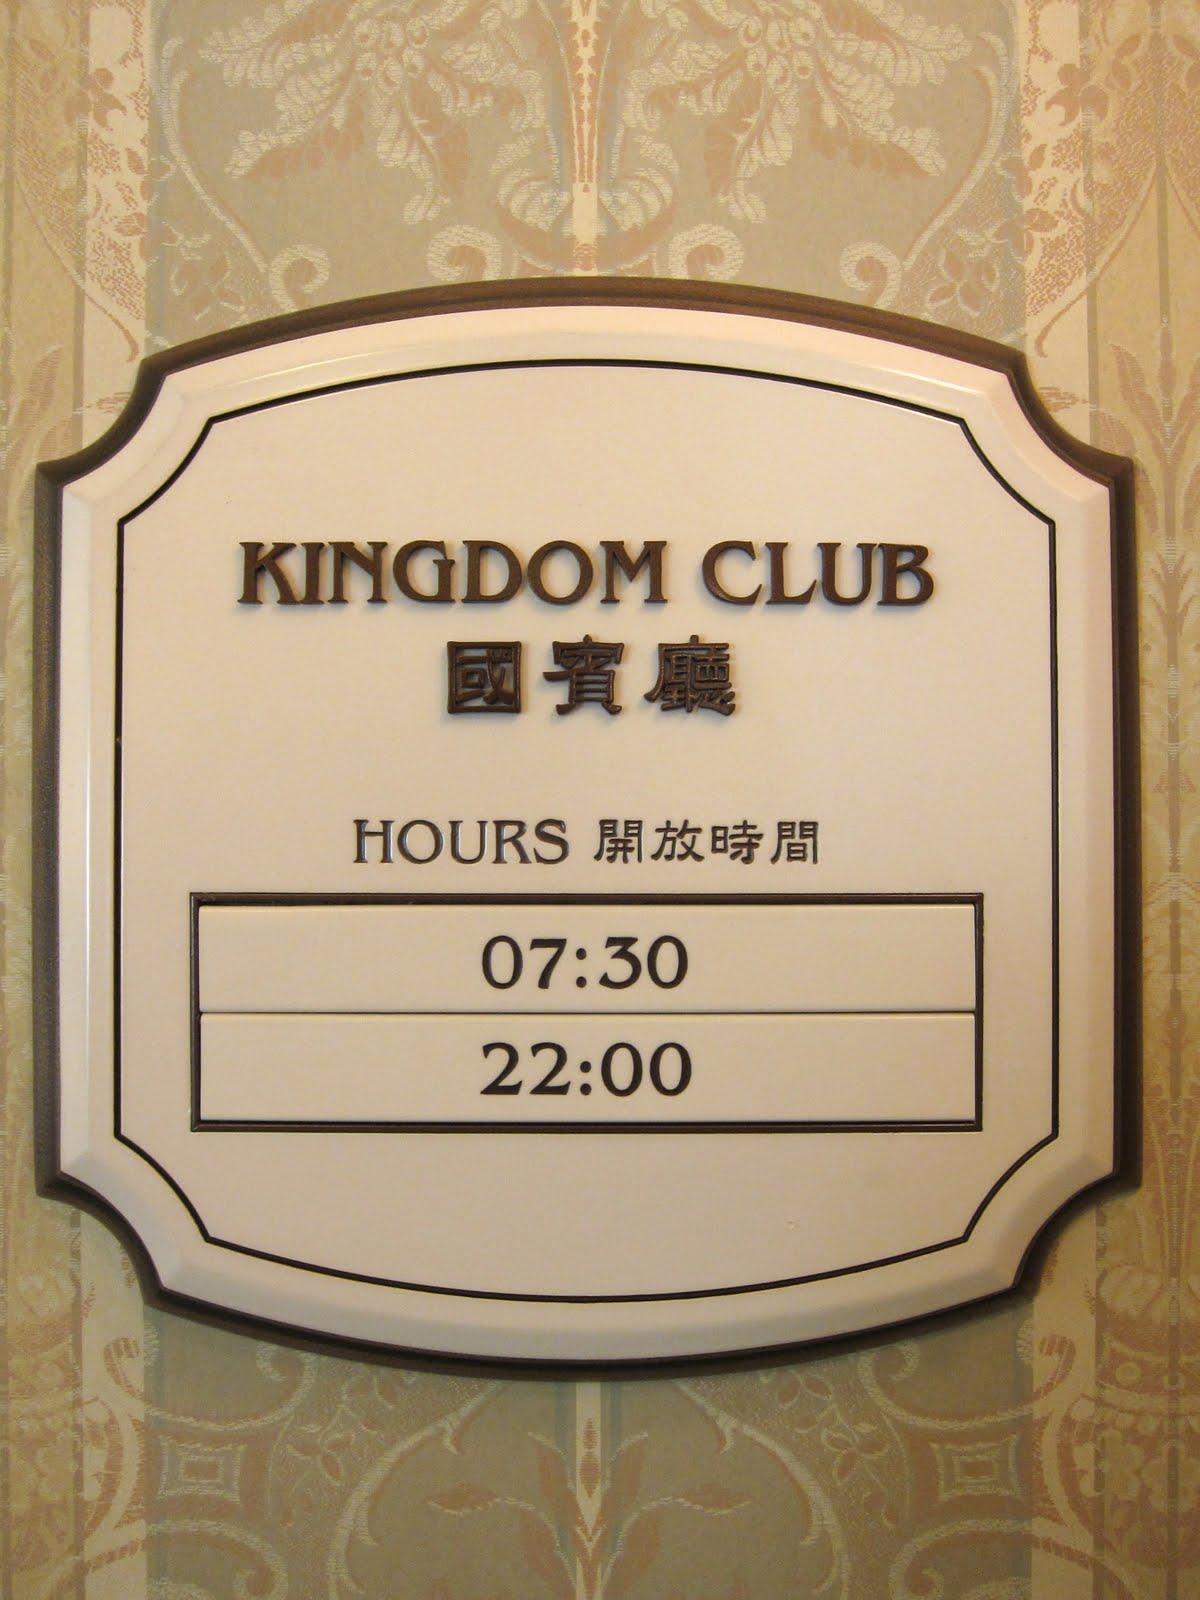 hong kong disneyland hotel kingdom club hours pic